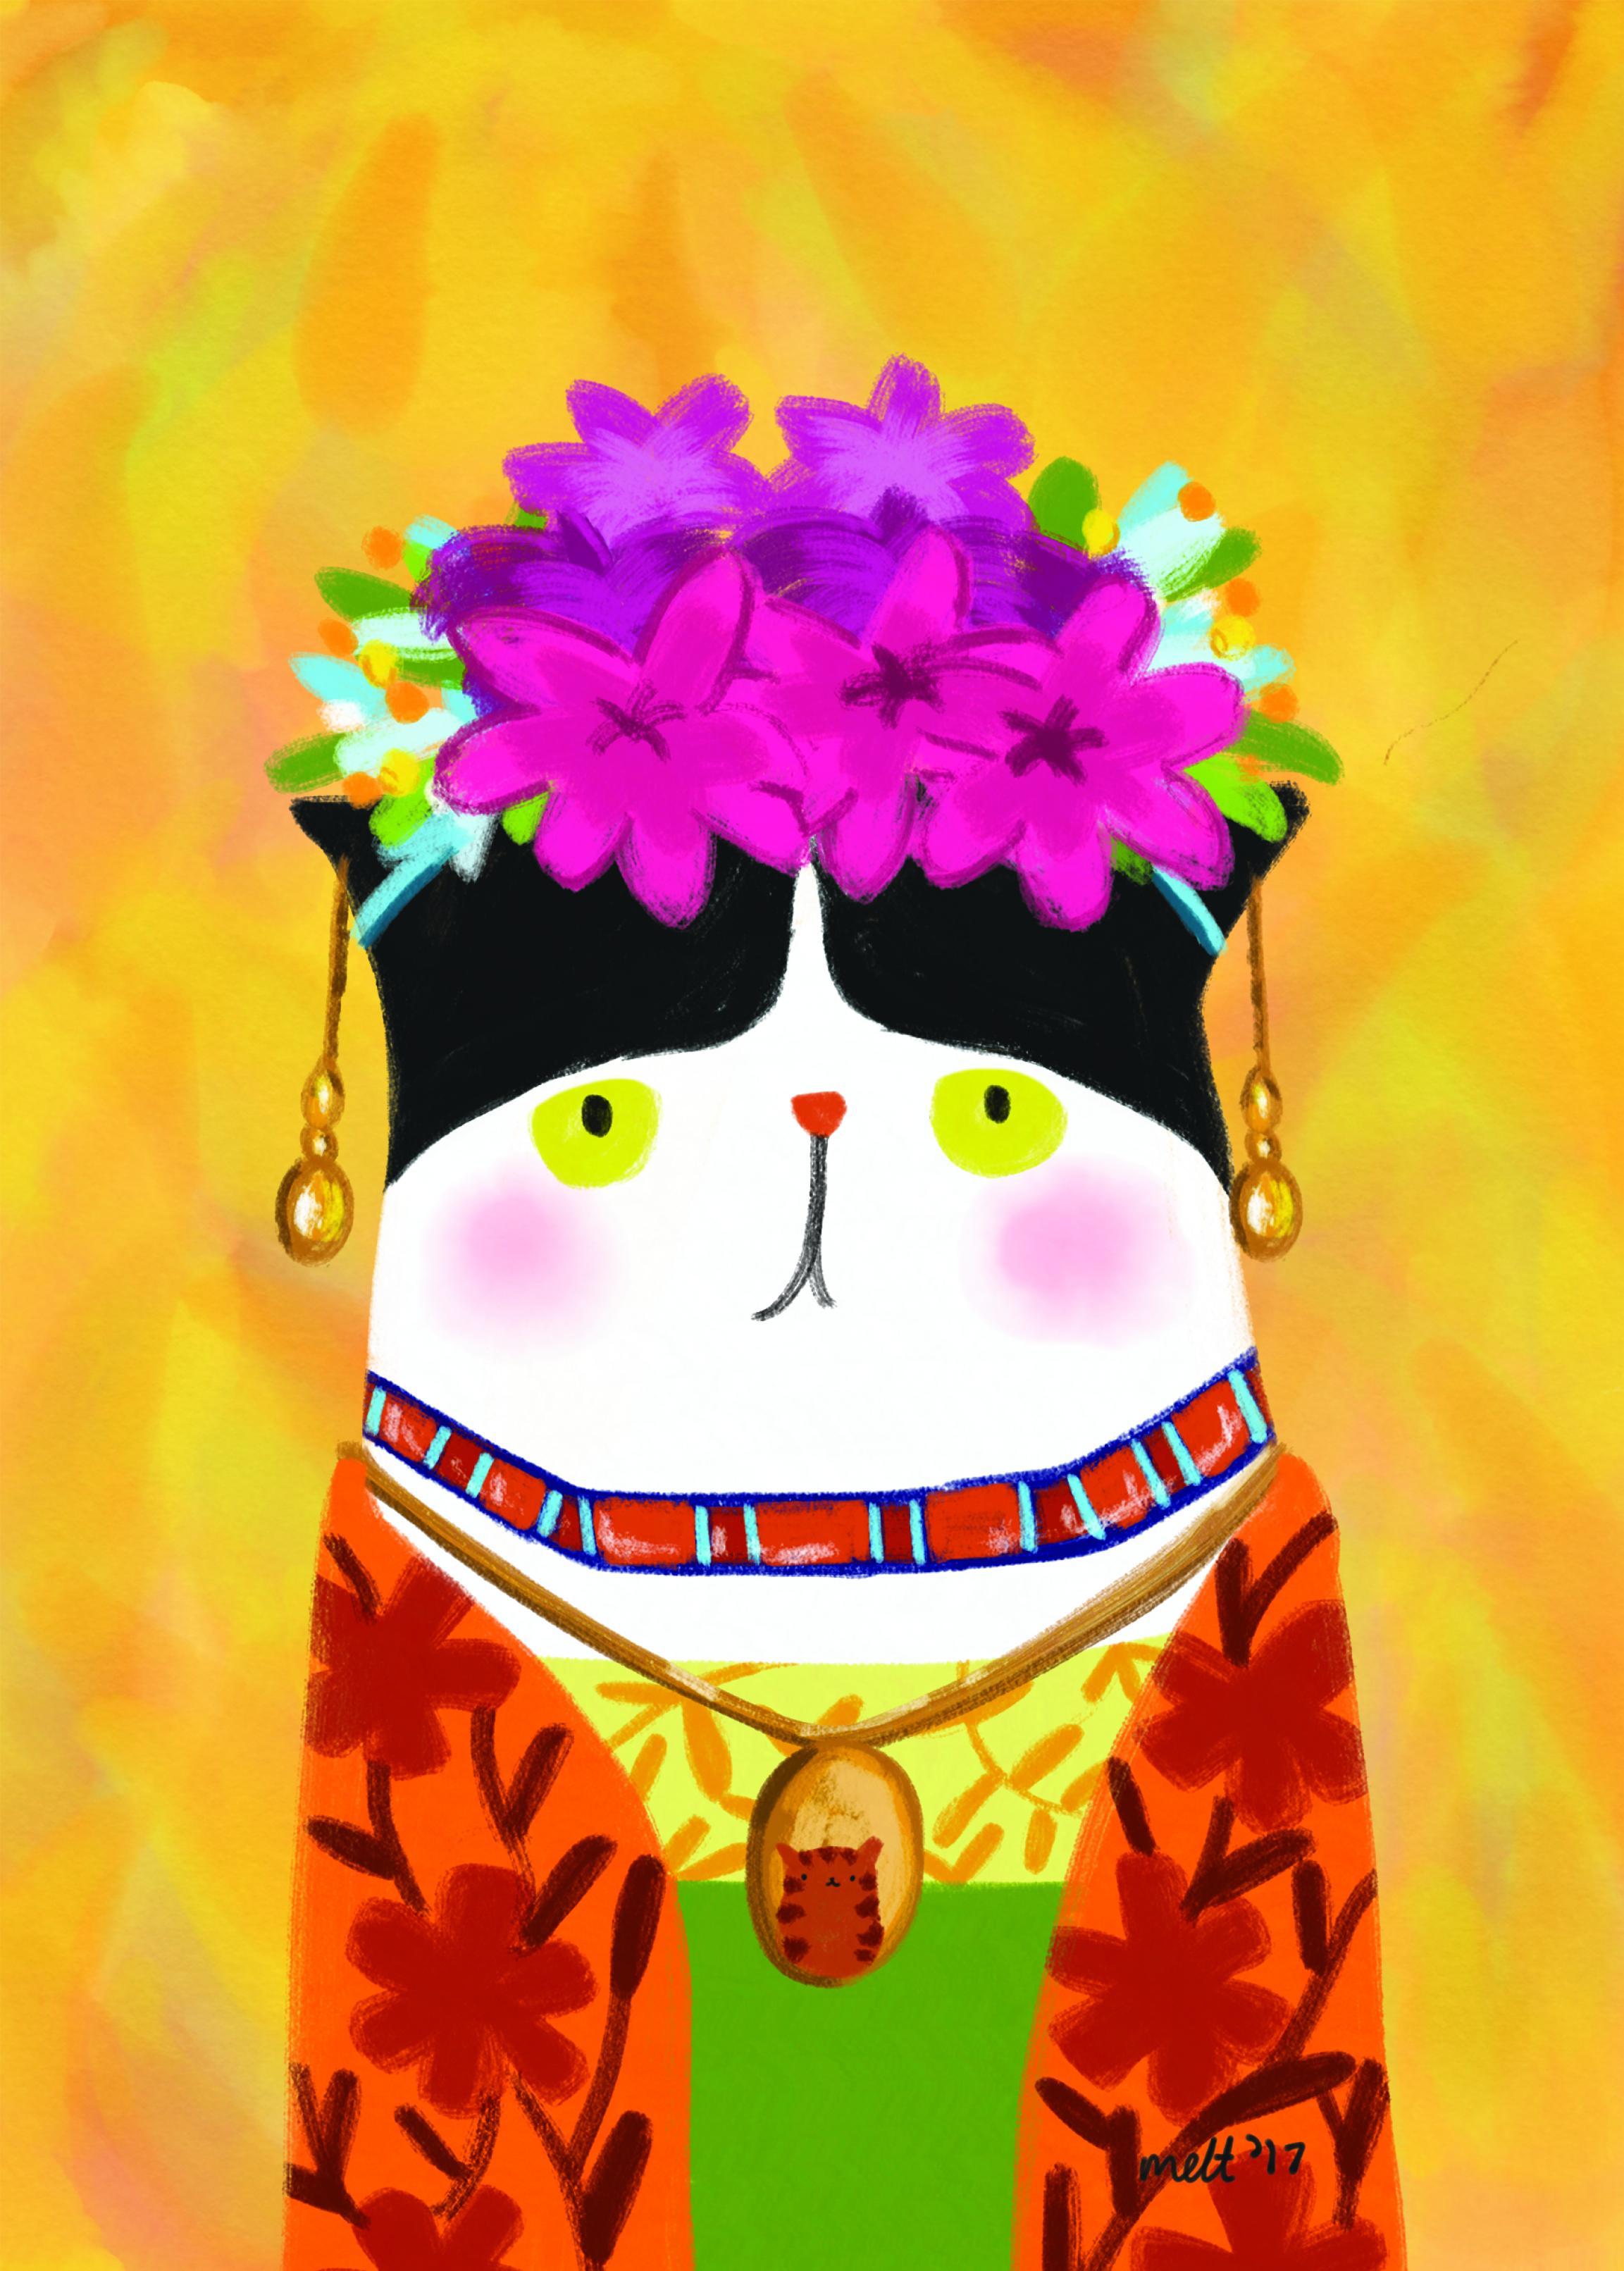 Mel 6_digital painting for SPCA magazine.jpg